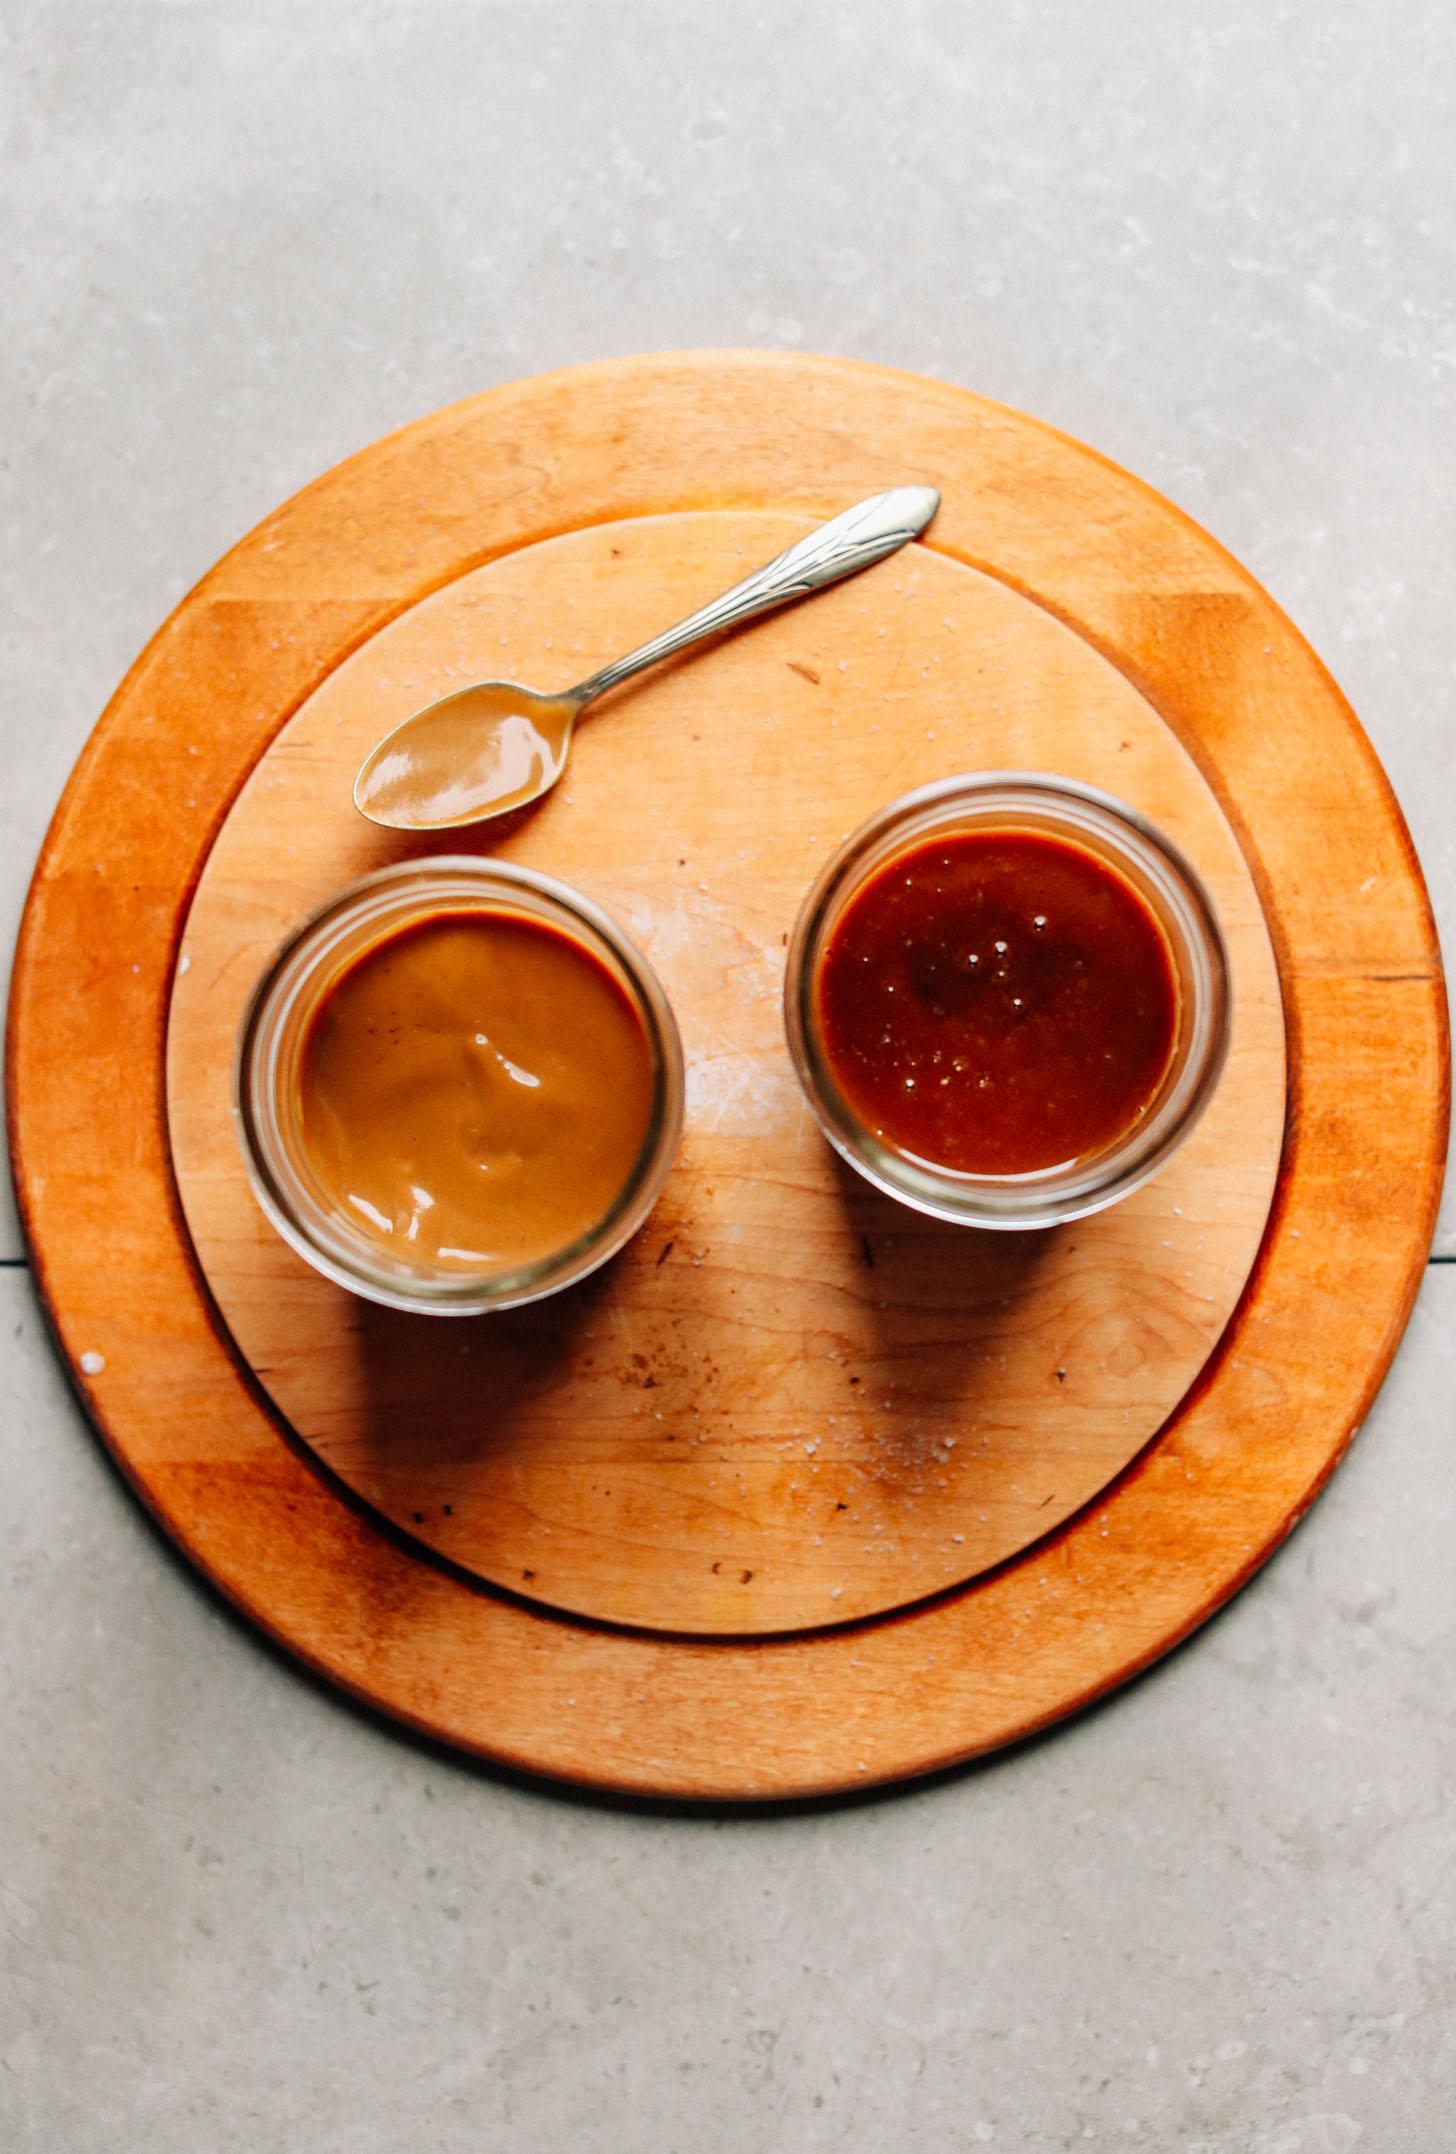 AMAZING Vegan Caramel Sauce! 5 ingredients, naturally sweetened, SO creamy, smooth and rich! #vegan #plantbased #dessert #refinedsugarfree #recipe #glutenfree #caramel #minimalistbaker